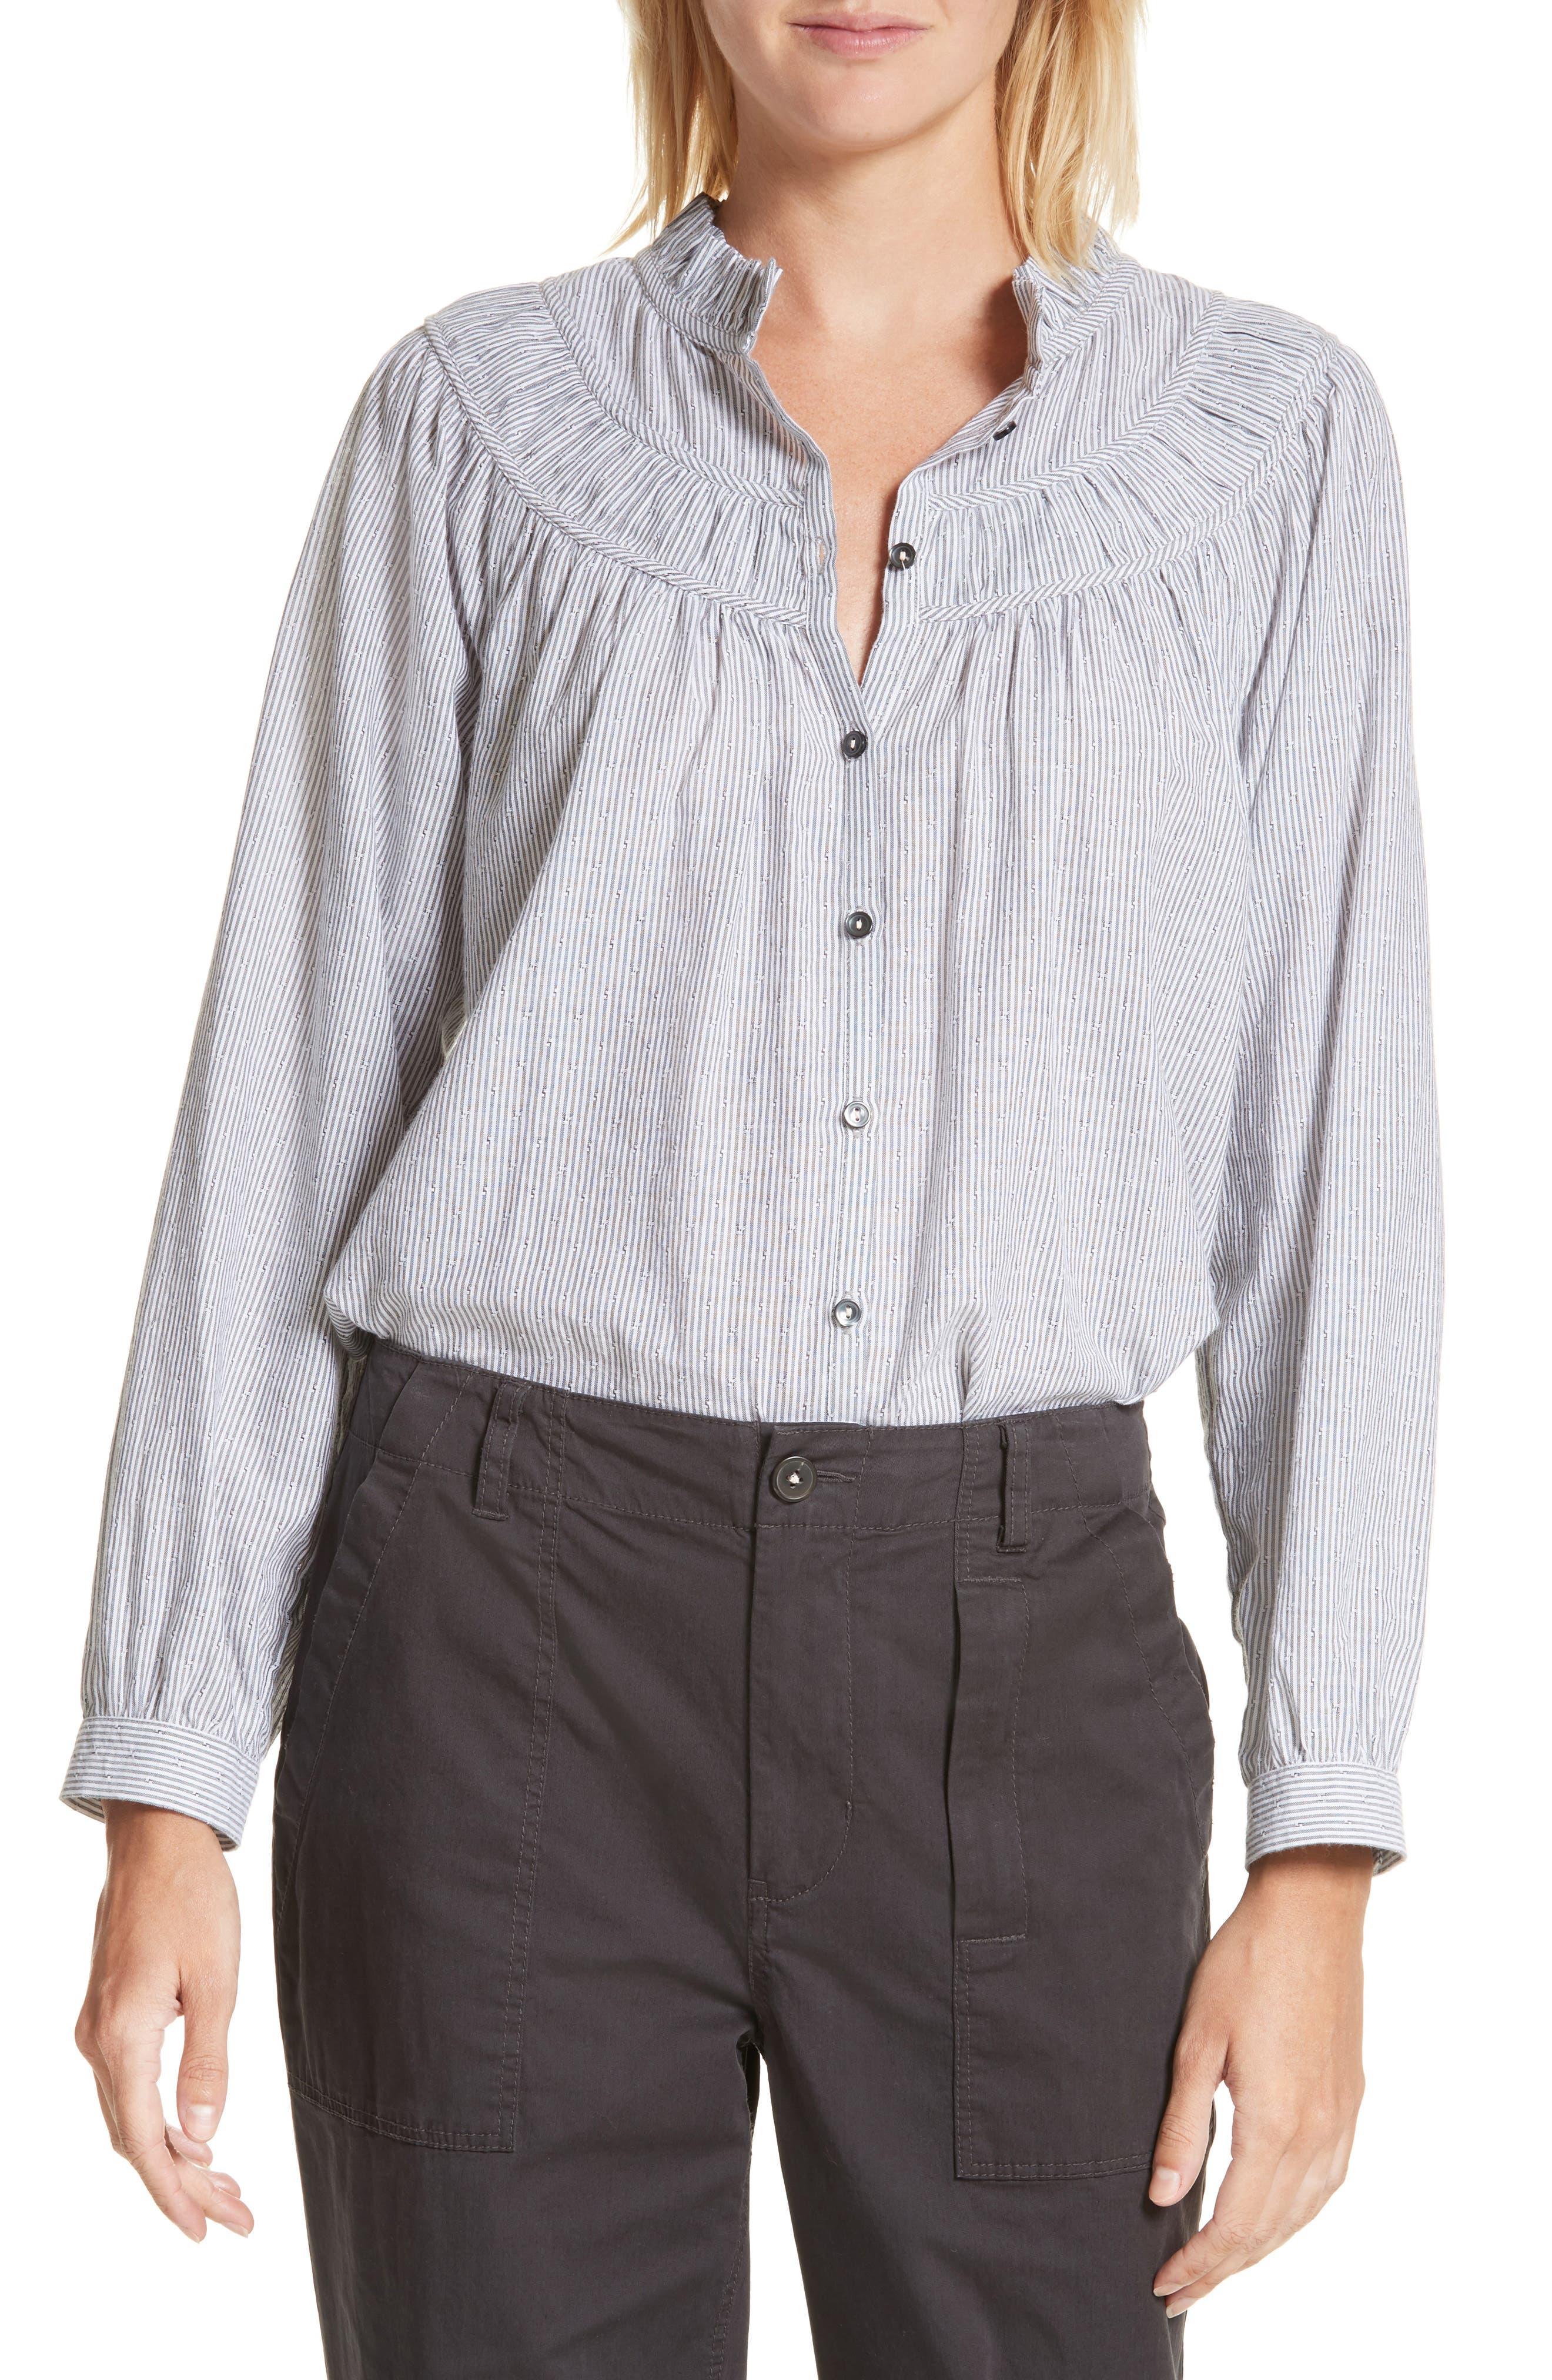 La Vie Rebecca Taylor Stripe Long Sleeve Ruffle Shirt